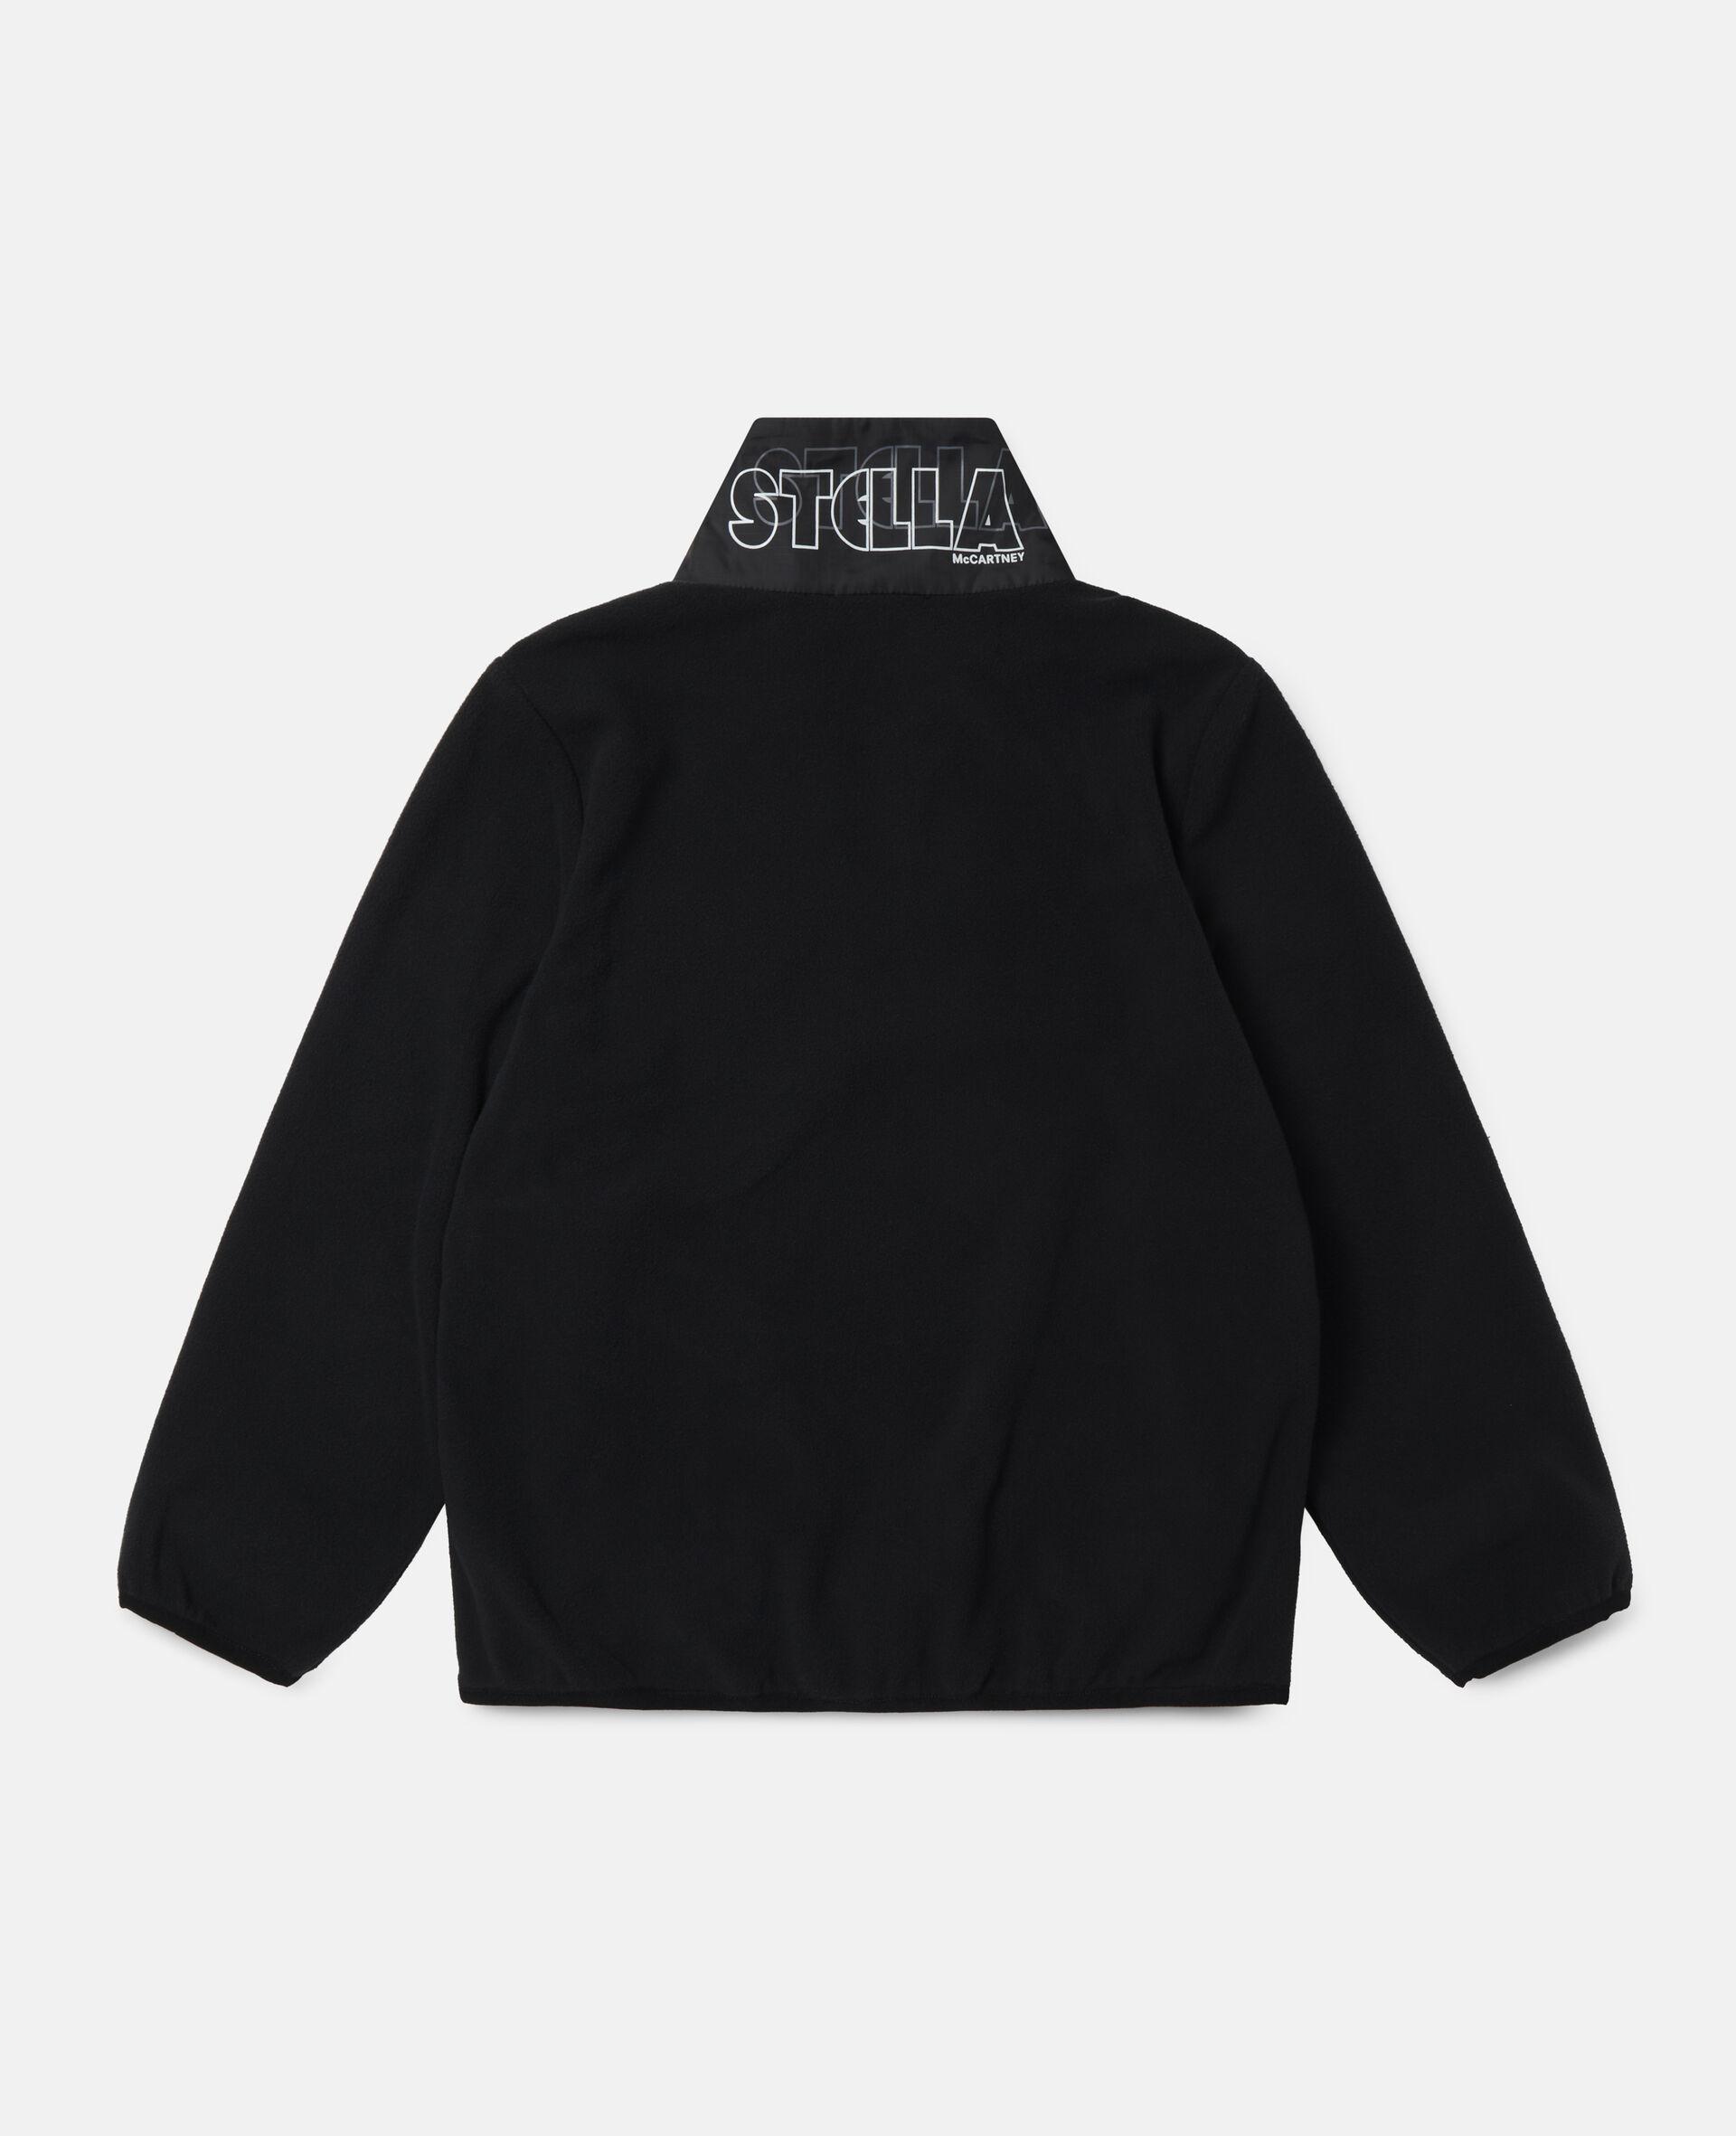 Sweat-shirt en polaire sportif Stella-Noir-large image number 3